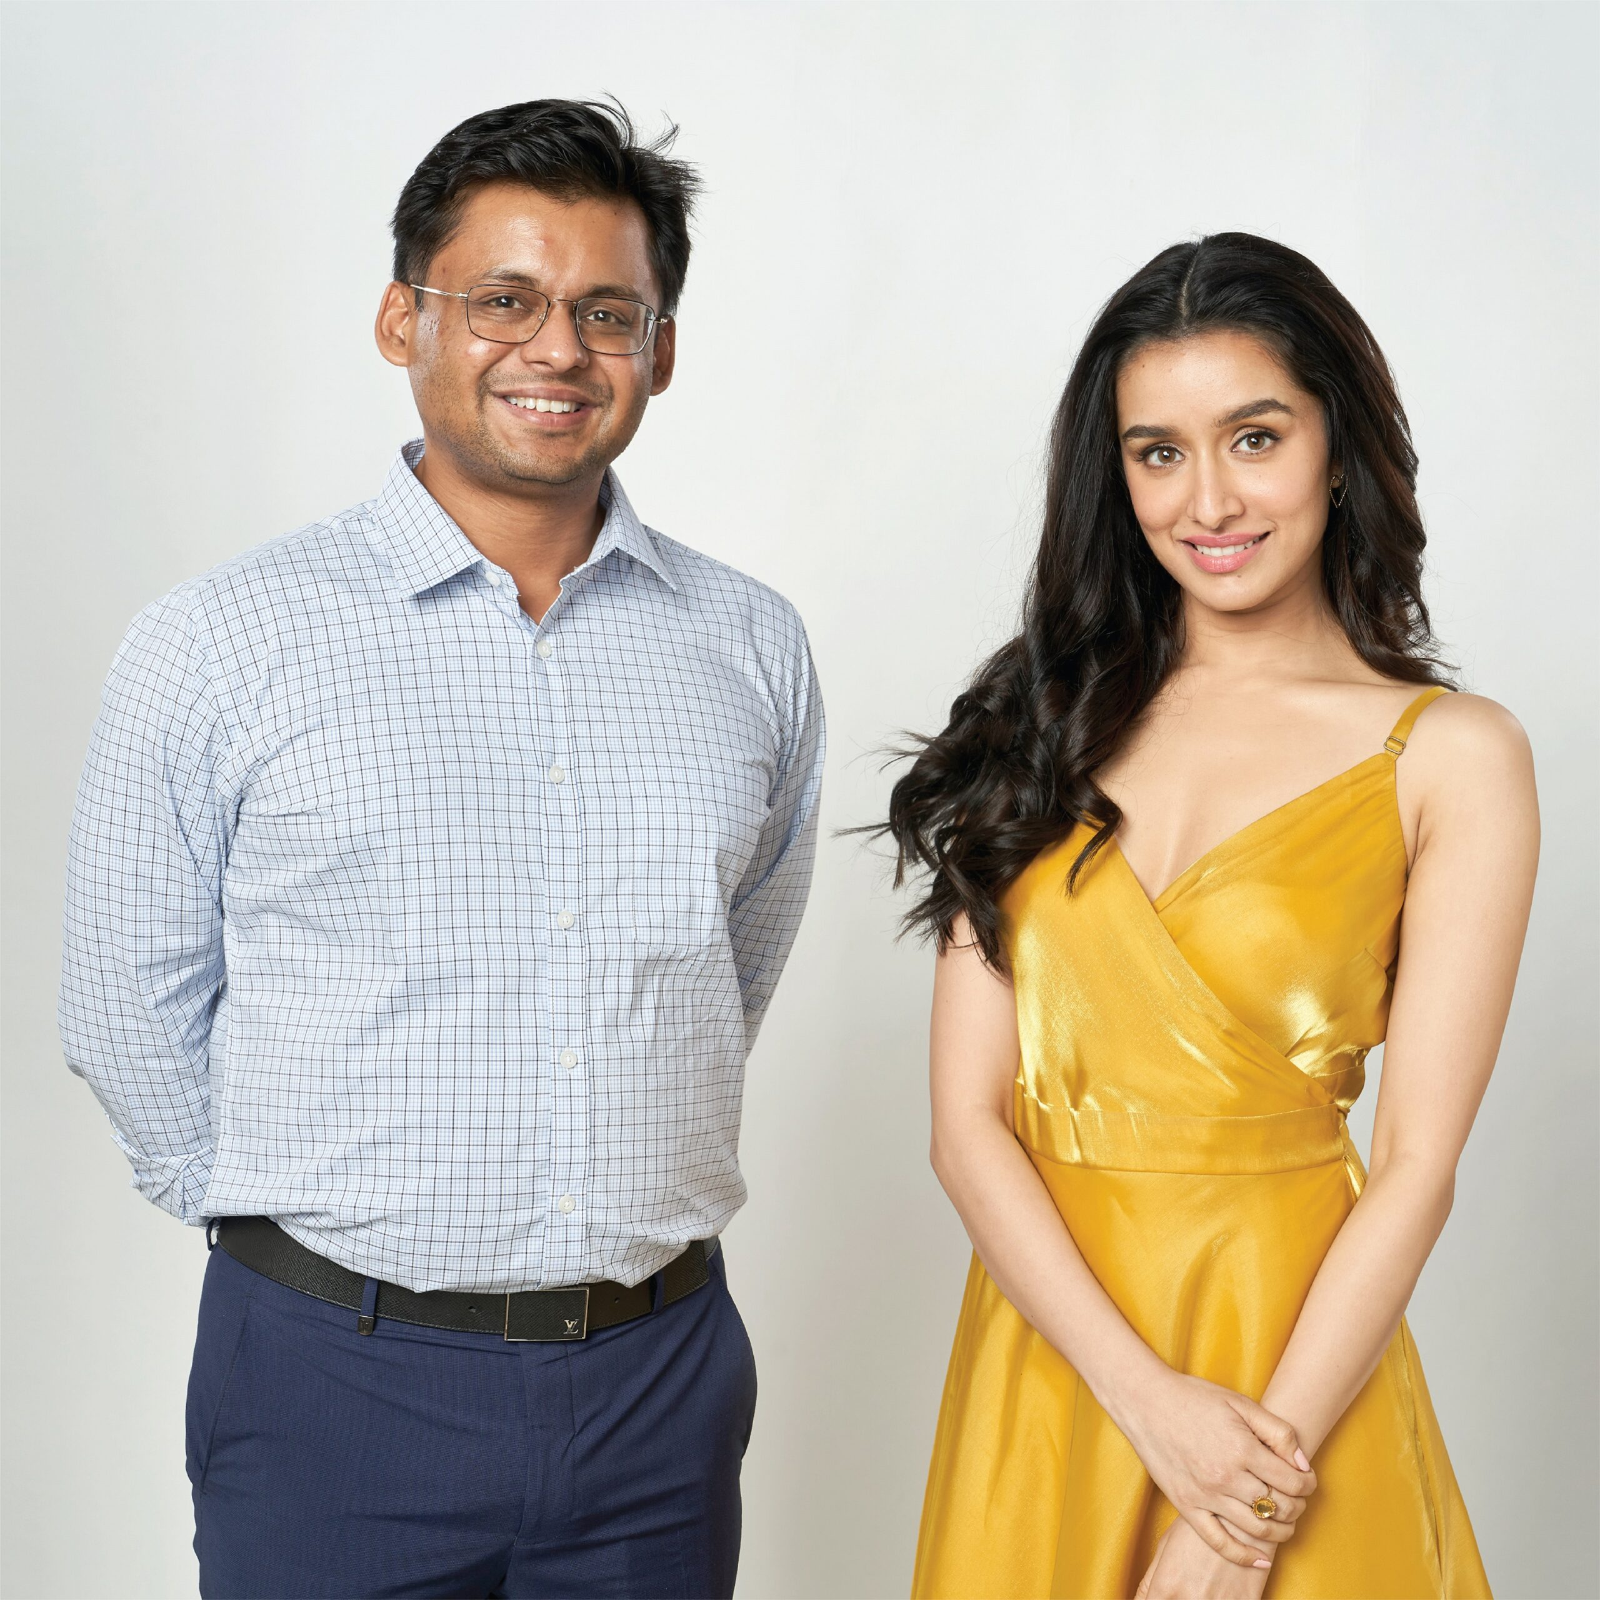 Bollywood Star Shraddha Kapoor roped in by Premium Home Furnishing Brand 'Bella Casa' as Brand Ambassador